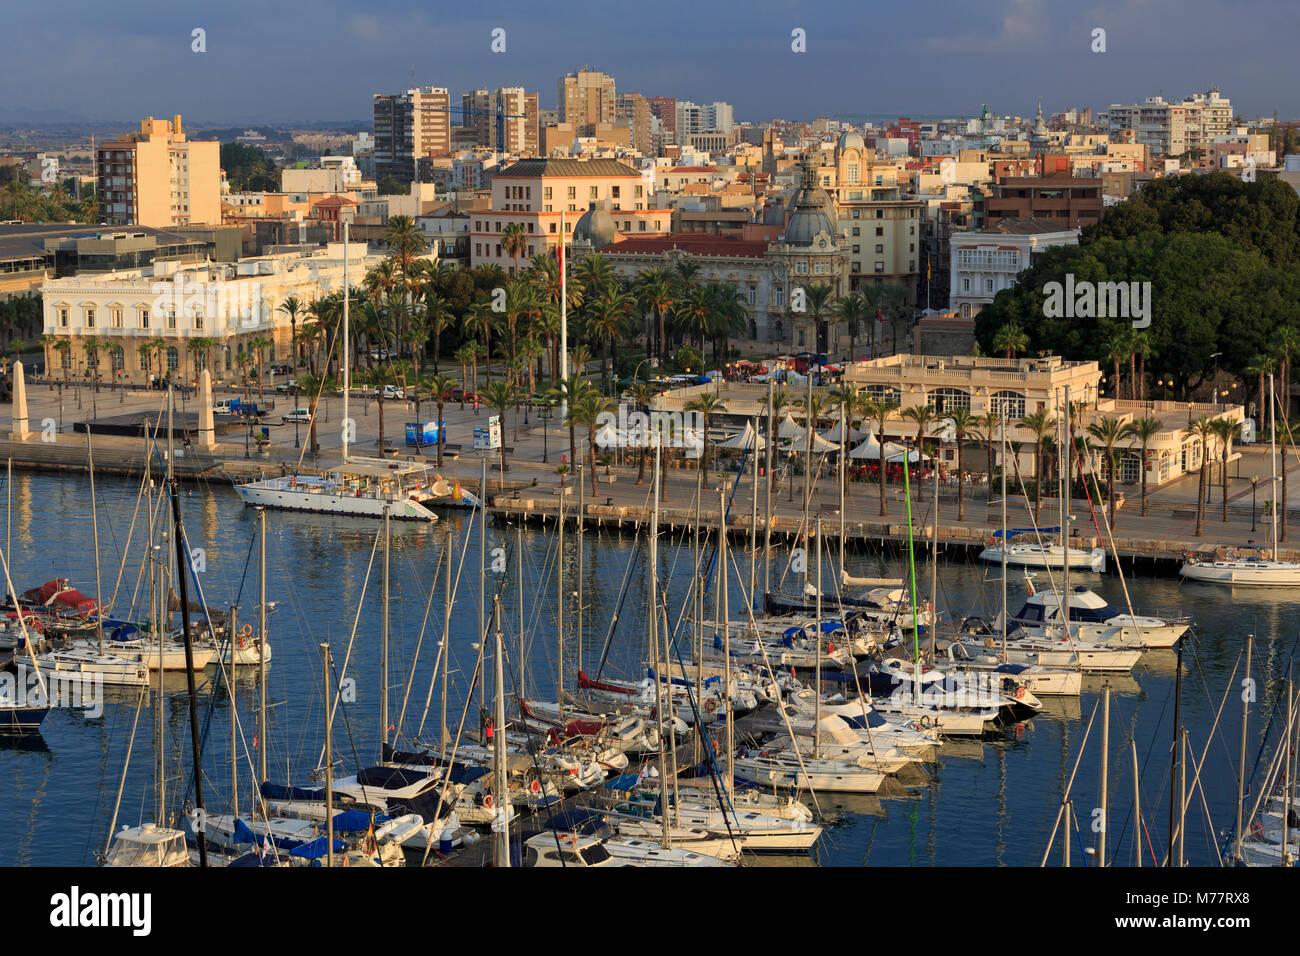 Marina, Port de Cartagena, Murcia, Spain, Europe Photo Stock